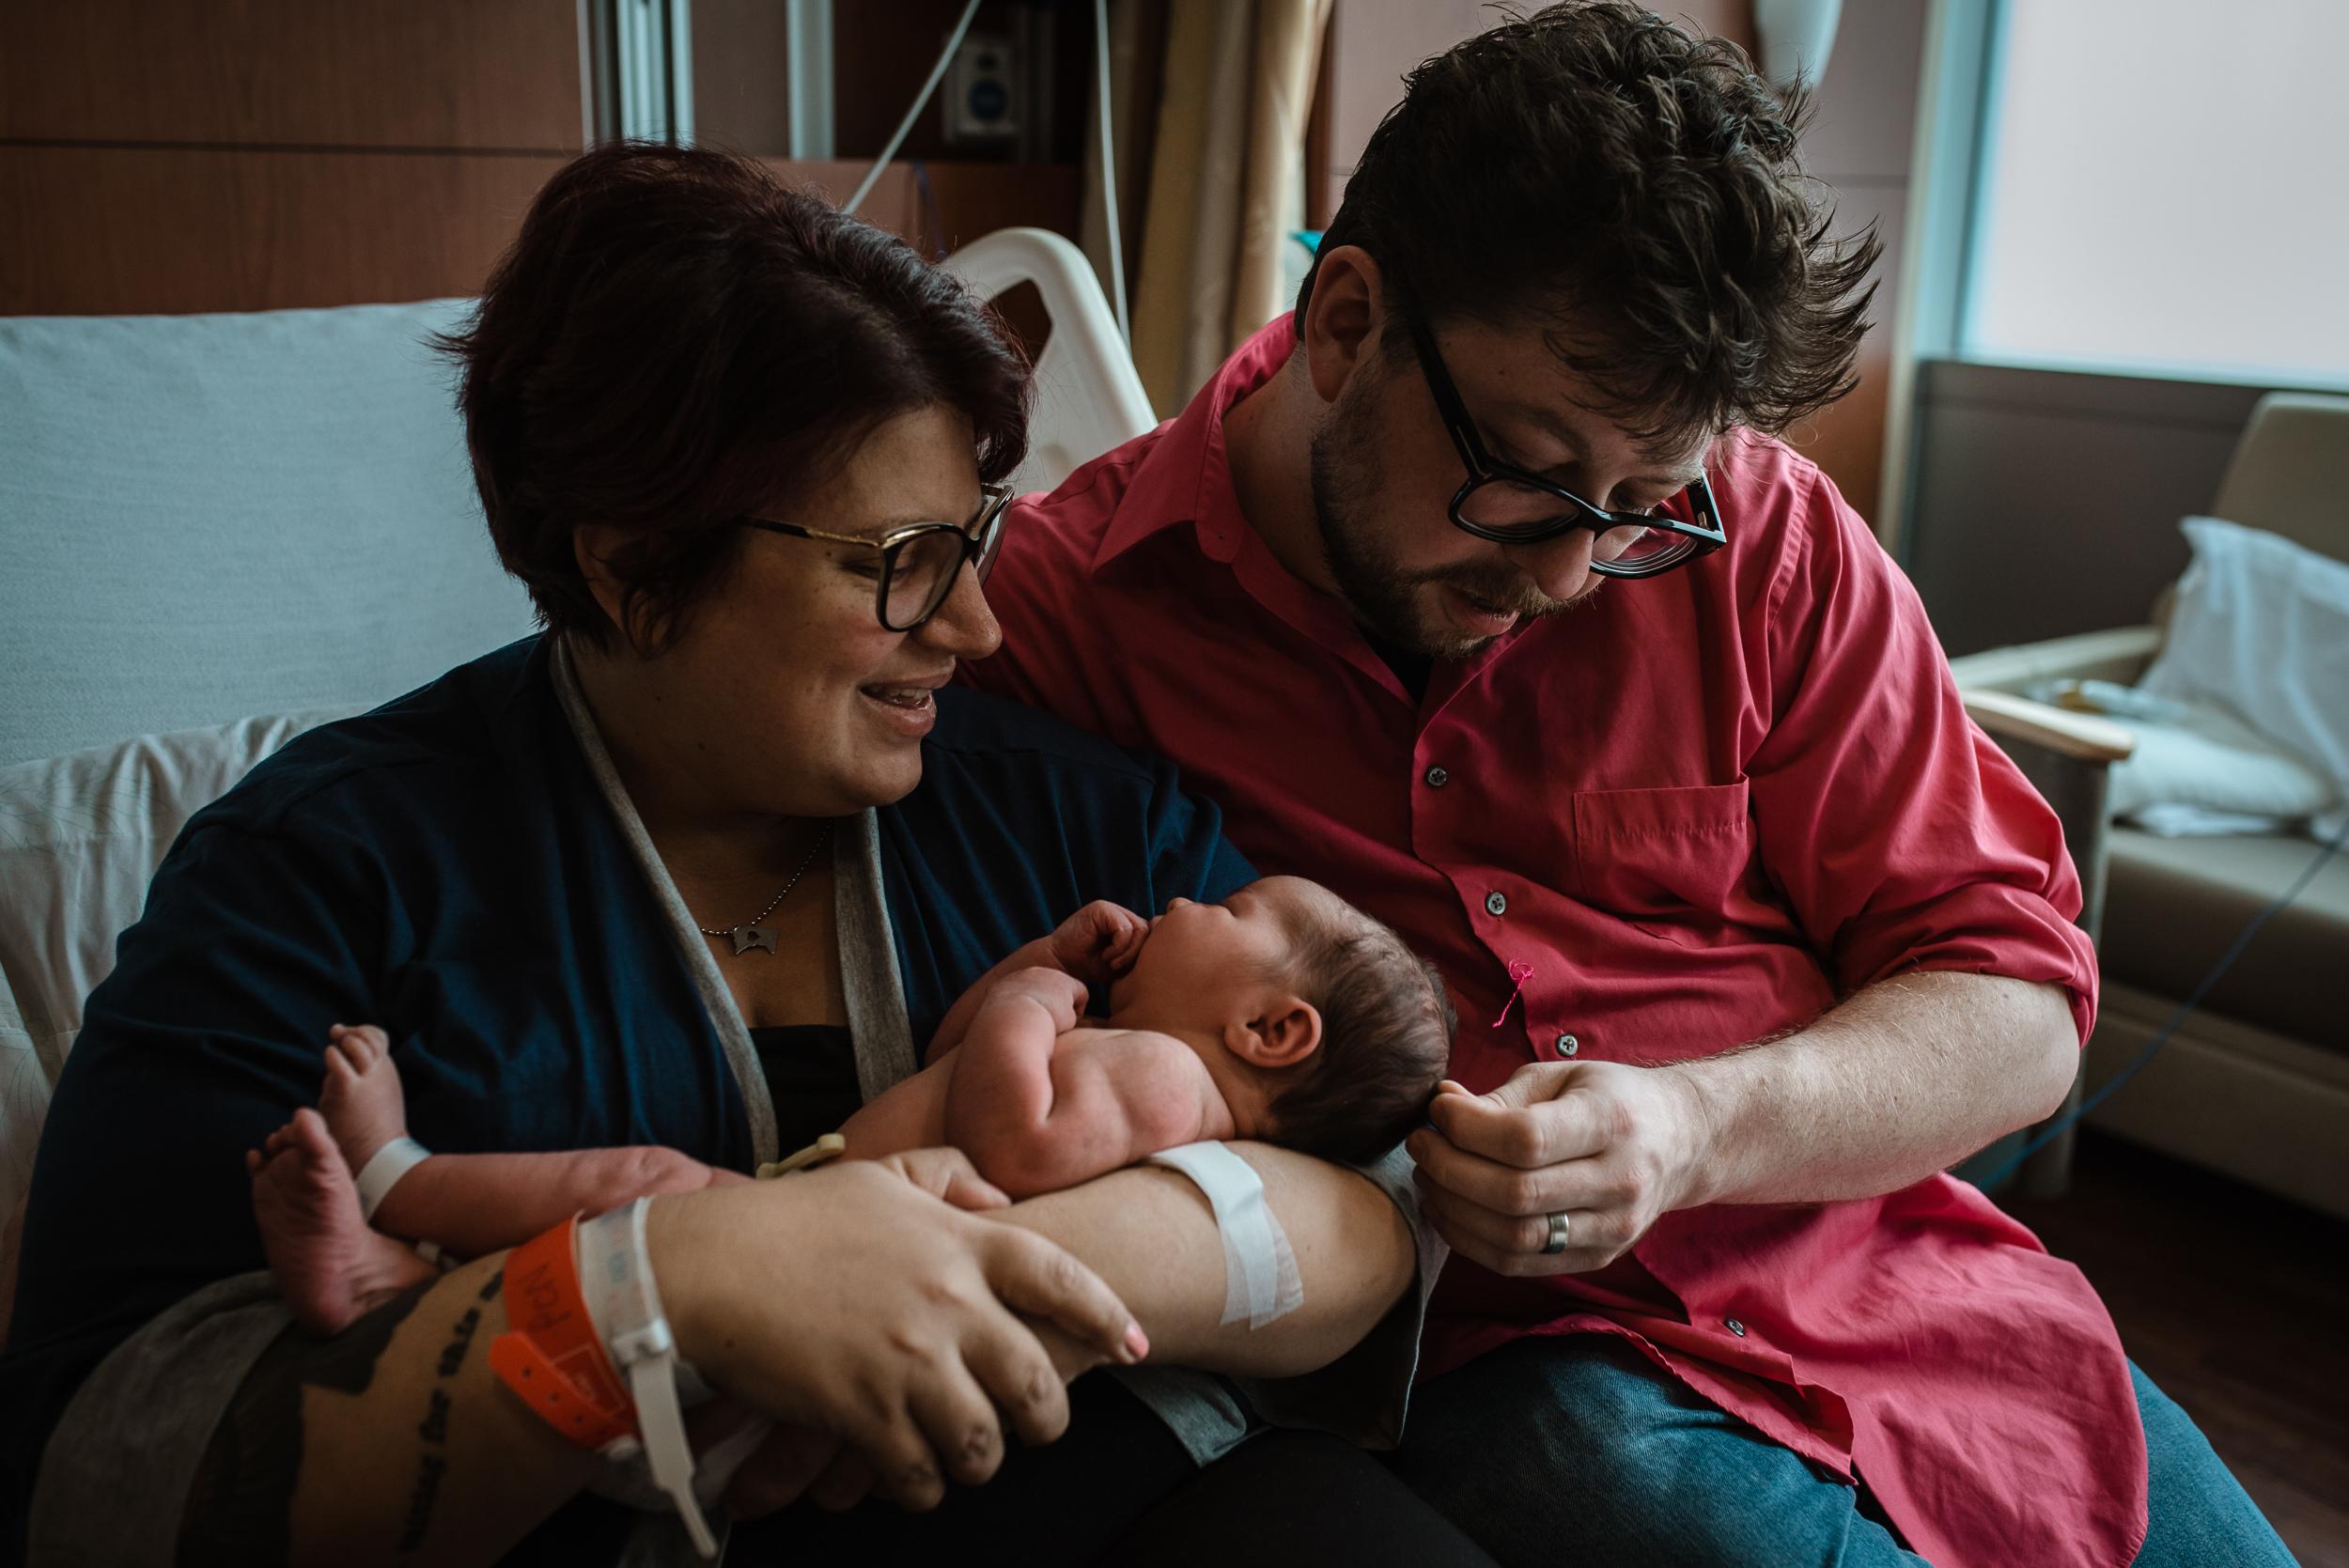 Meredith Westin Photography- Minneapolis Birth Stories and Films-November 09, 2018-132315.jpg